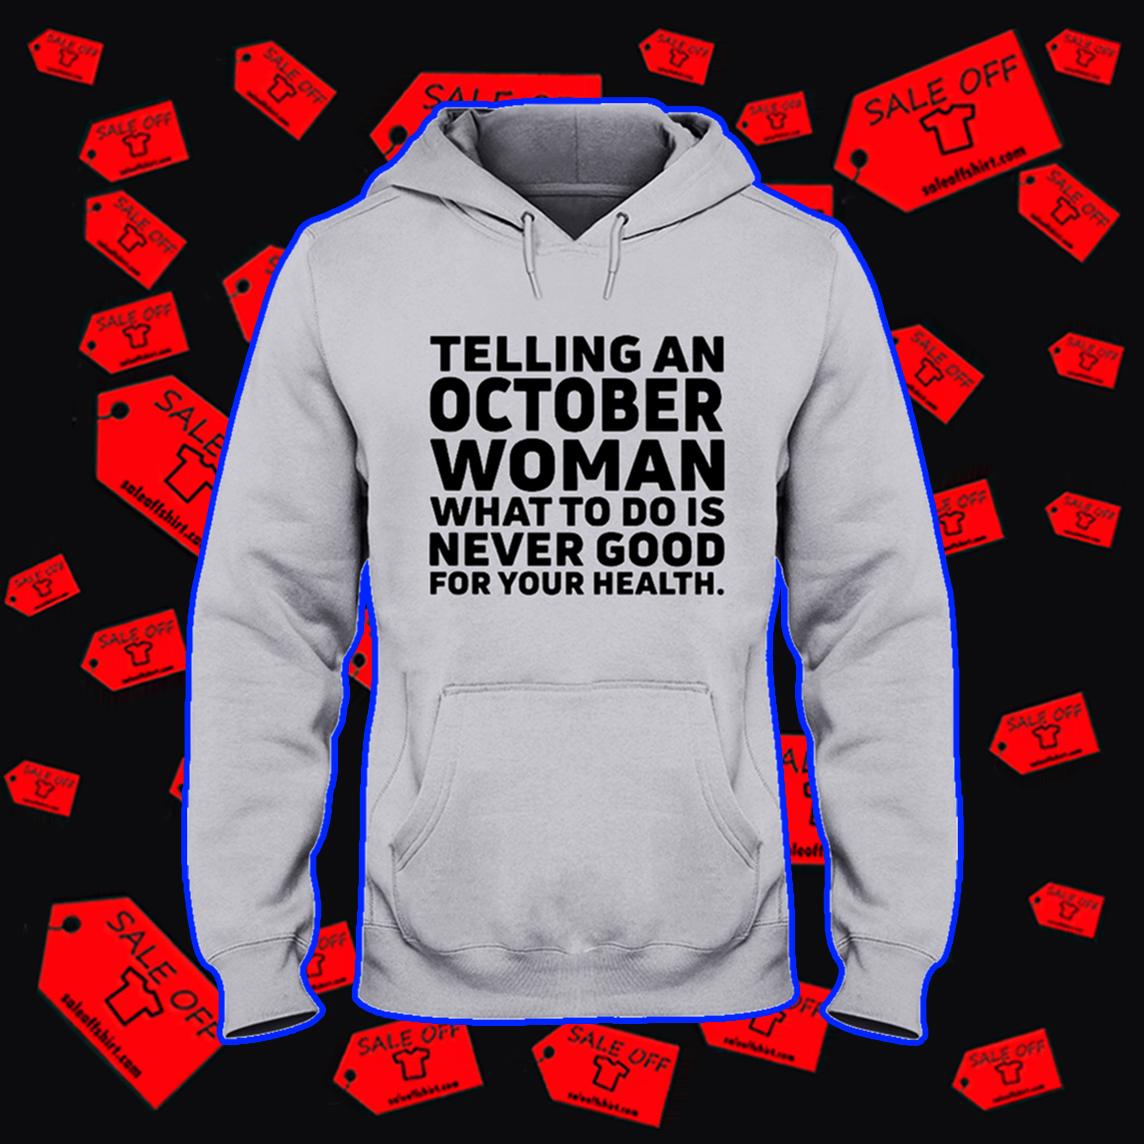 Telling an october woman hooded sweatshirt